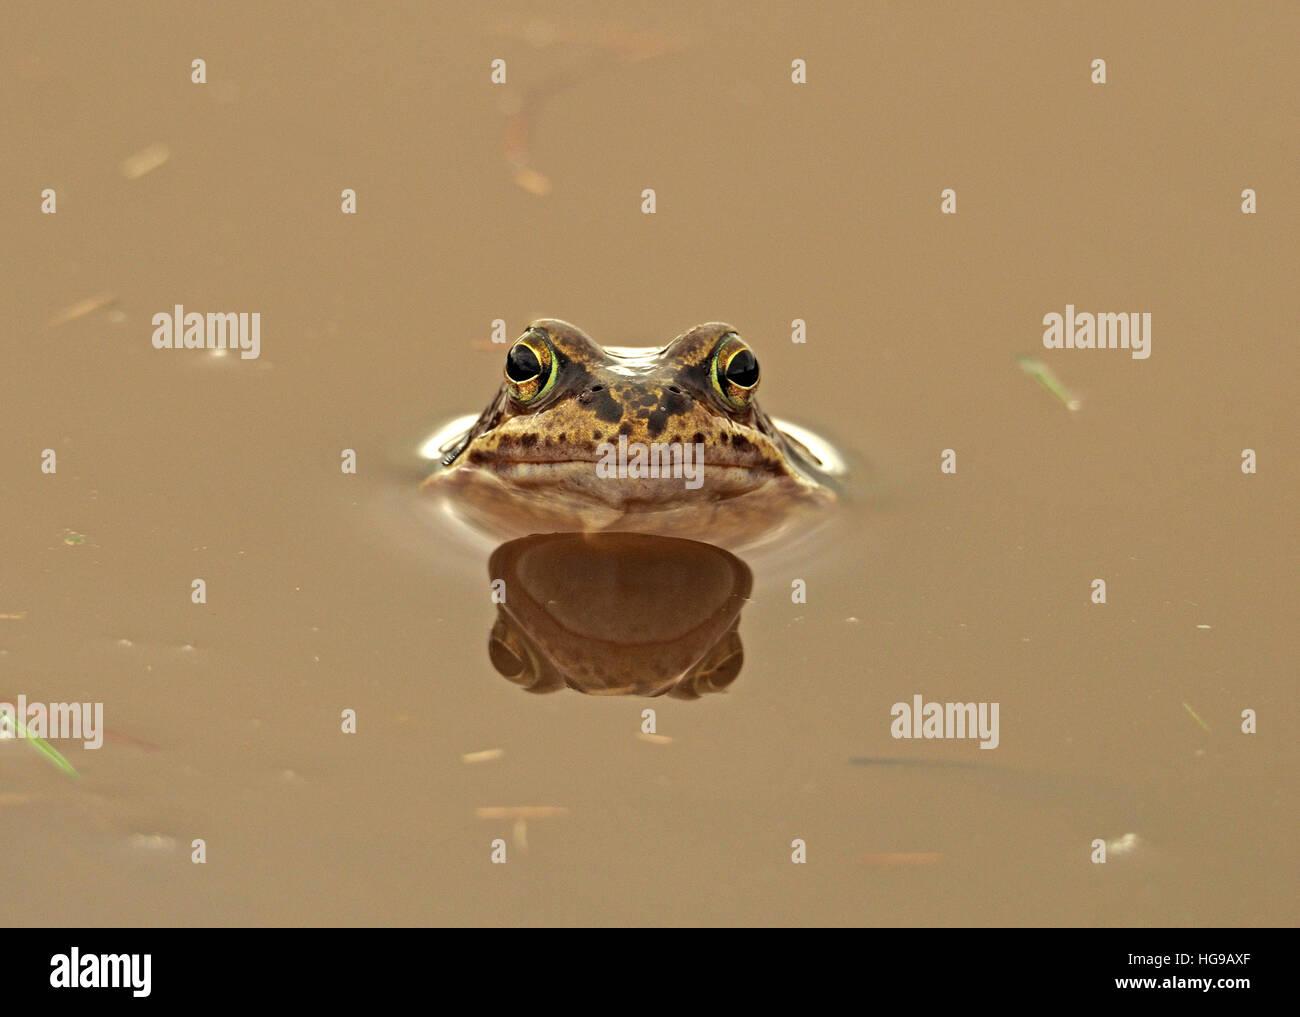 Common Frog (Rana temporaria) European common frog/ European common brown frog/ European grass frog & reflection - Stock Image